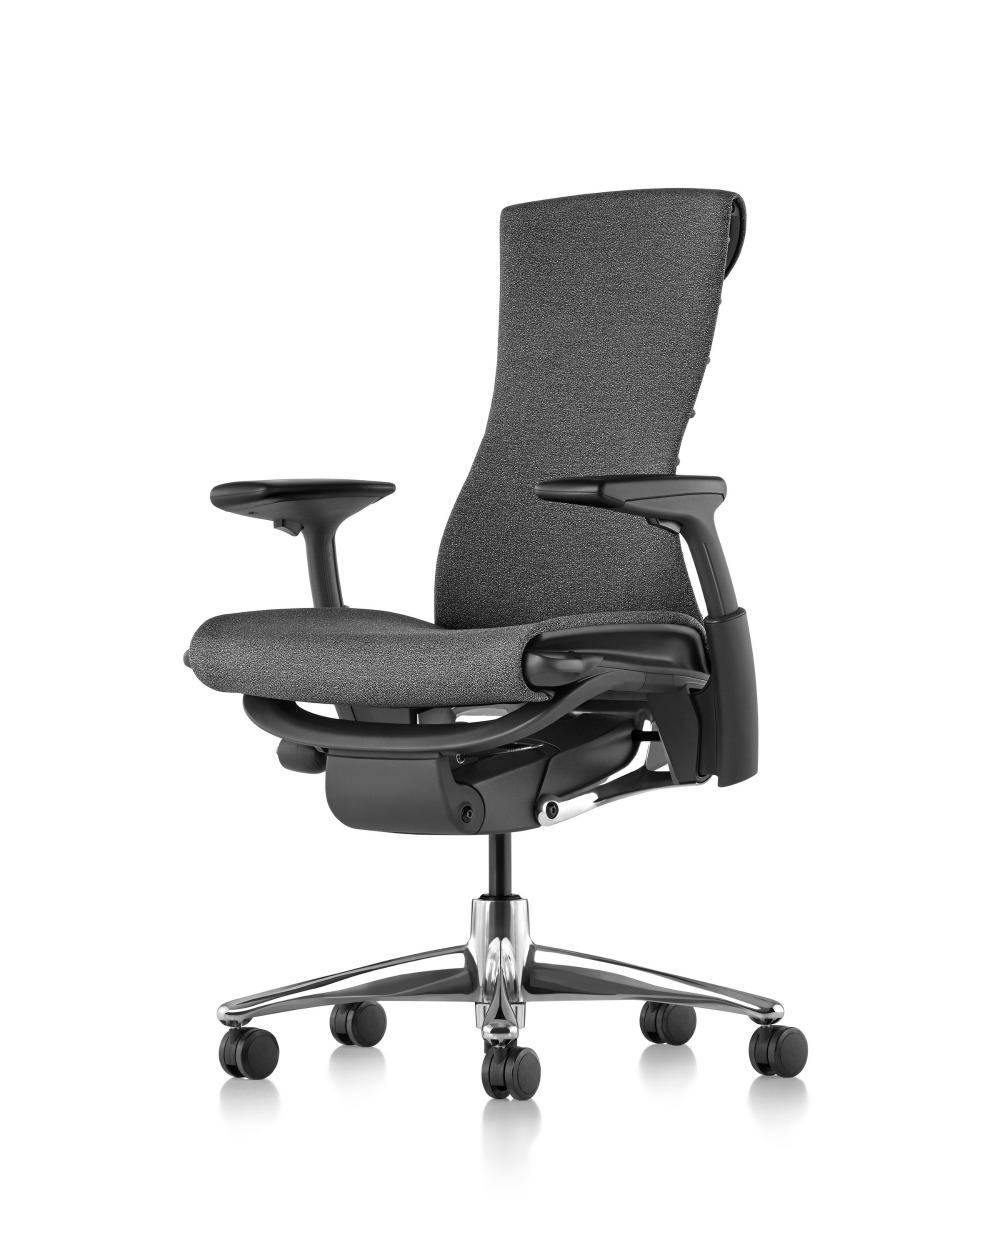 sillas de oficina ergonomicas herman miller embody adeyaka